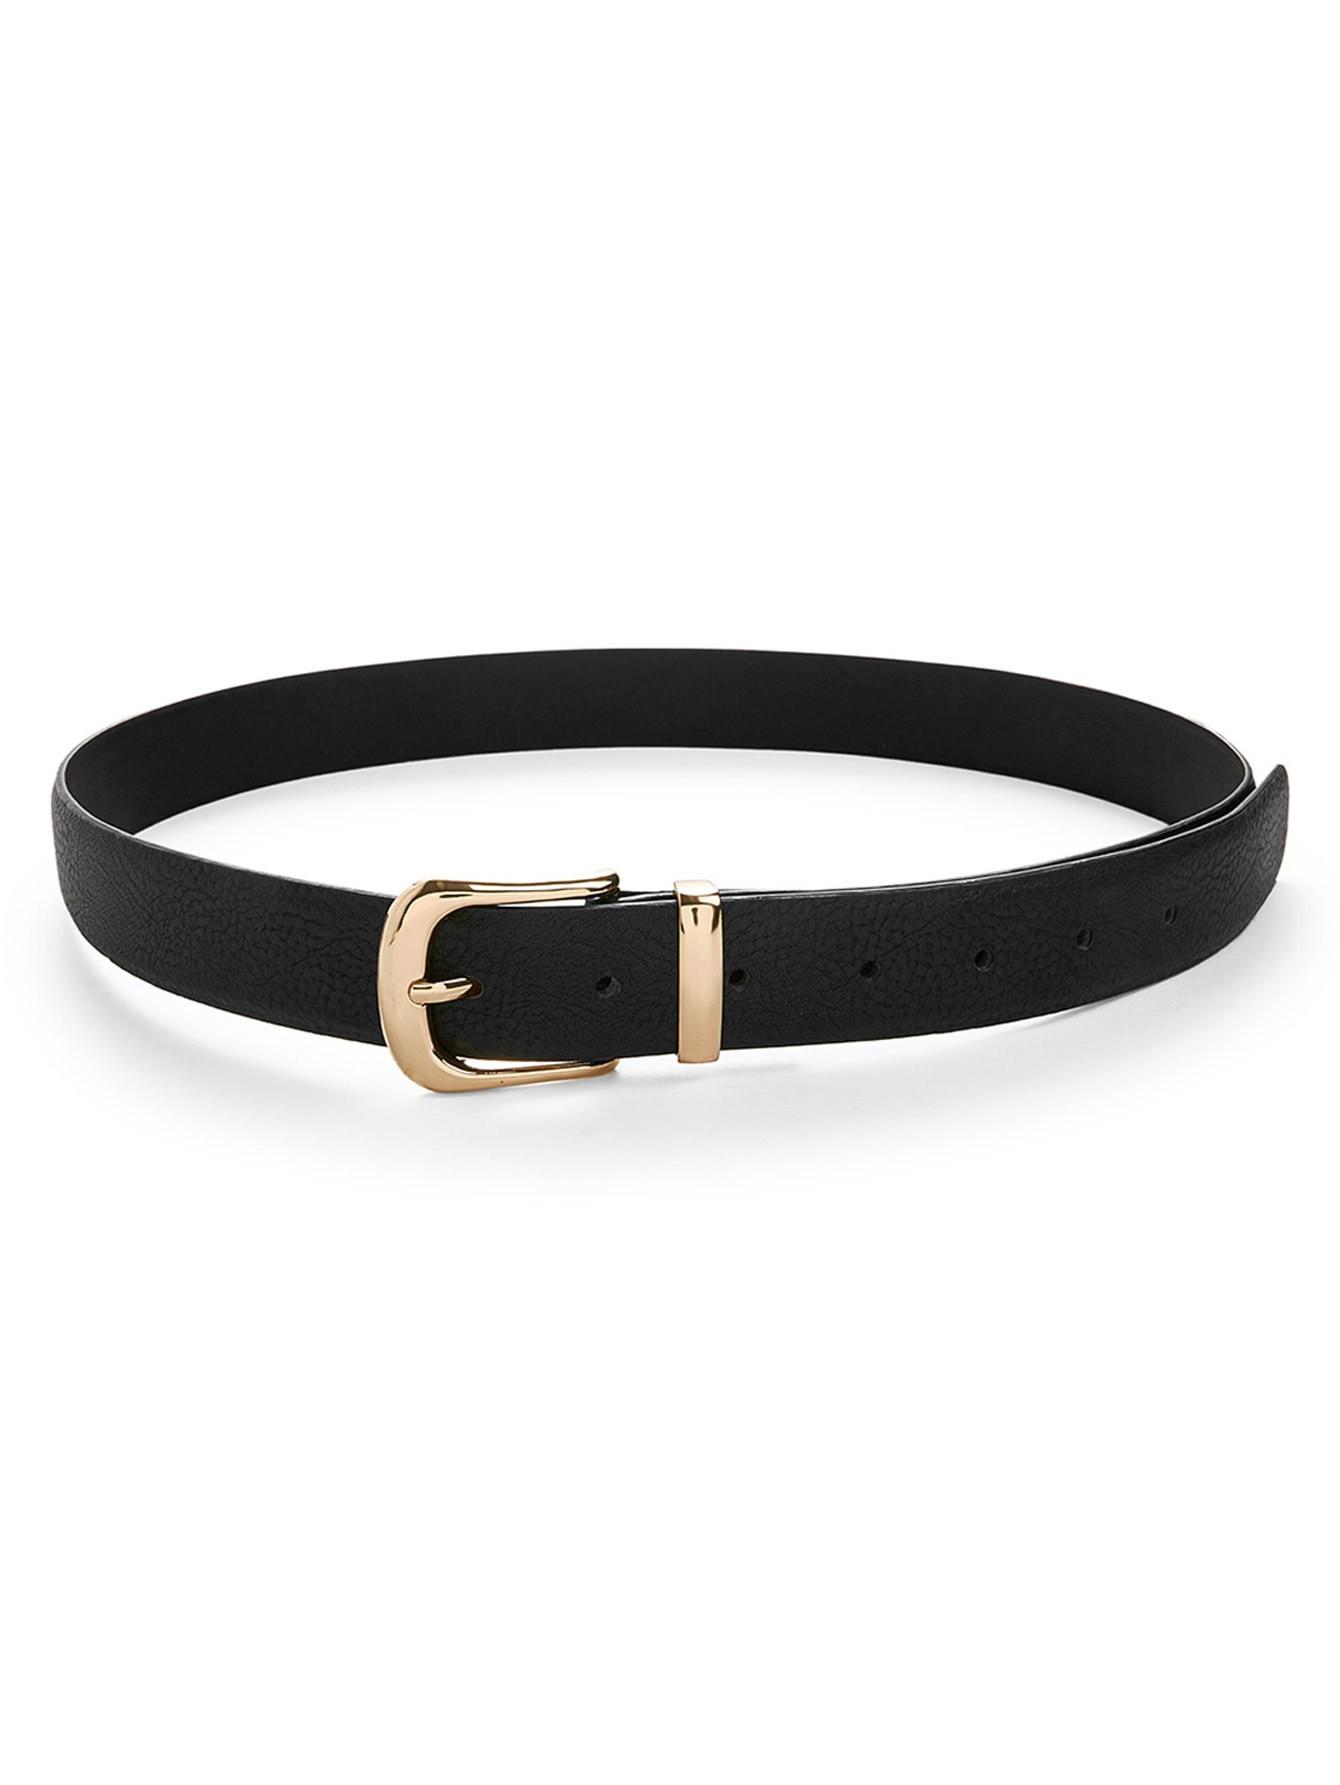 Metal Buckle Belt belt cp v2 metal